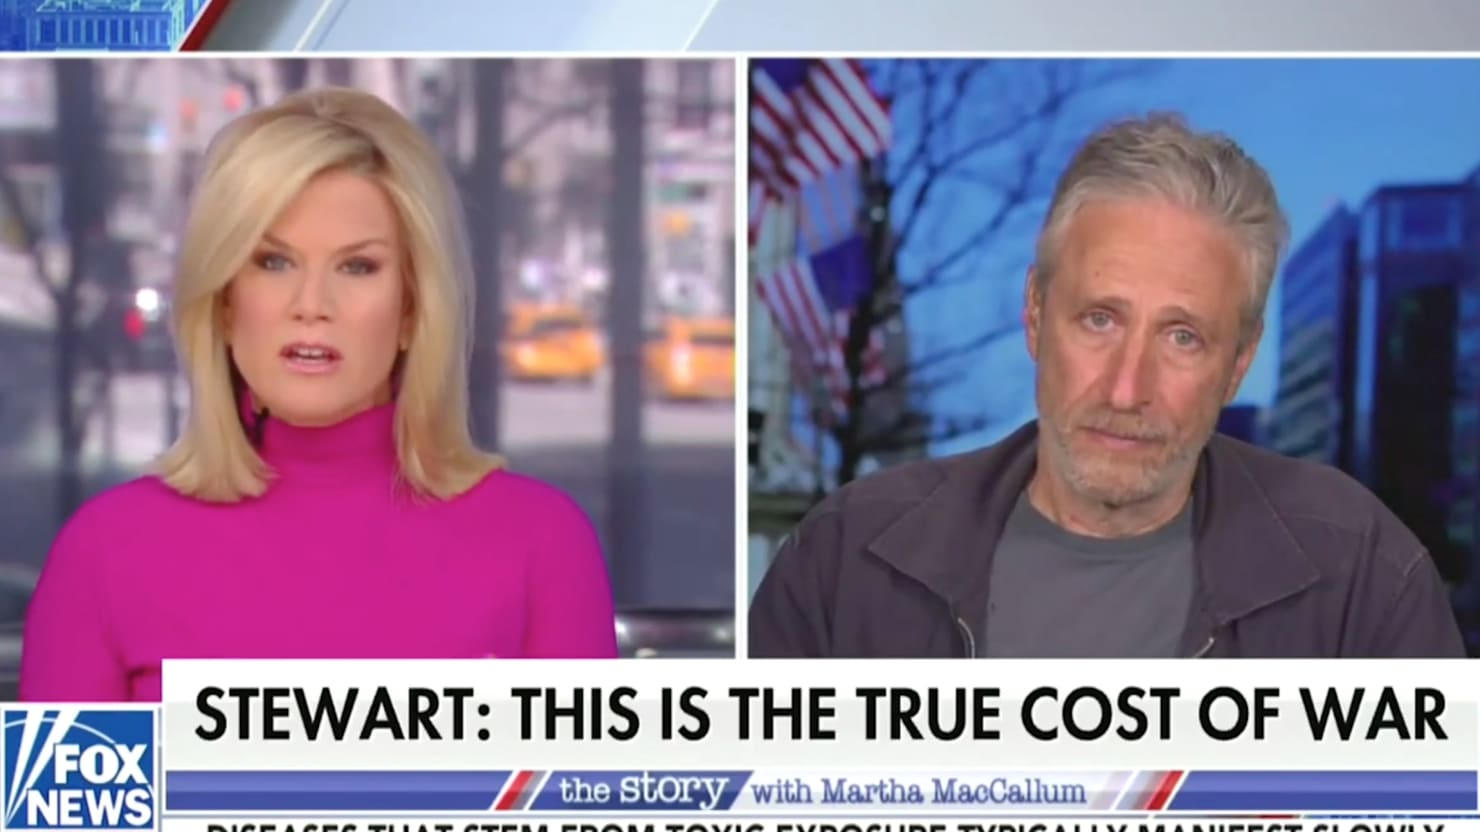 Fox News host Martha MacCallum tries and fails to lure Jon Stewart to attack Biden